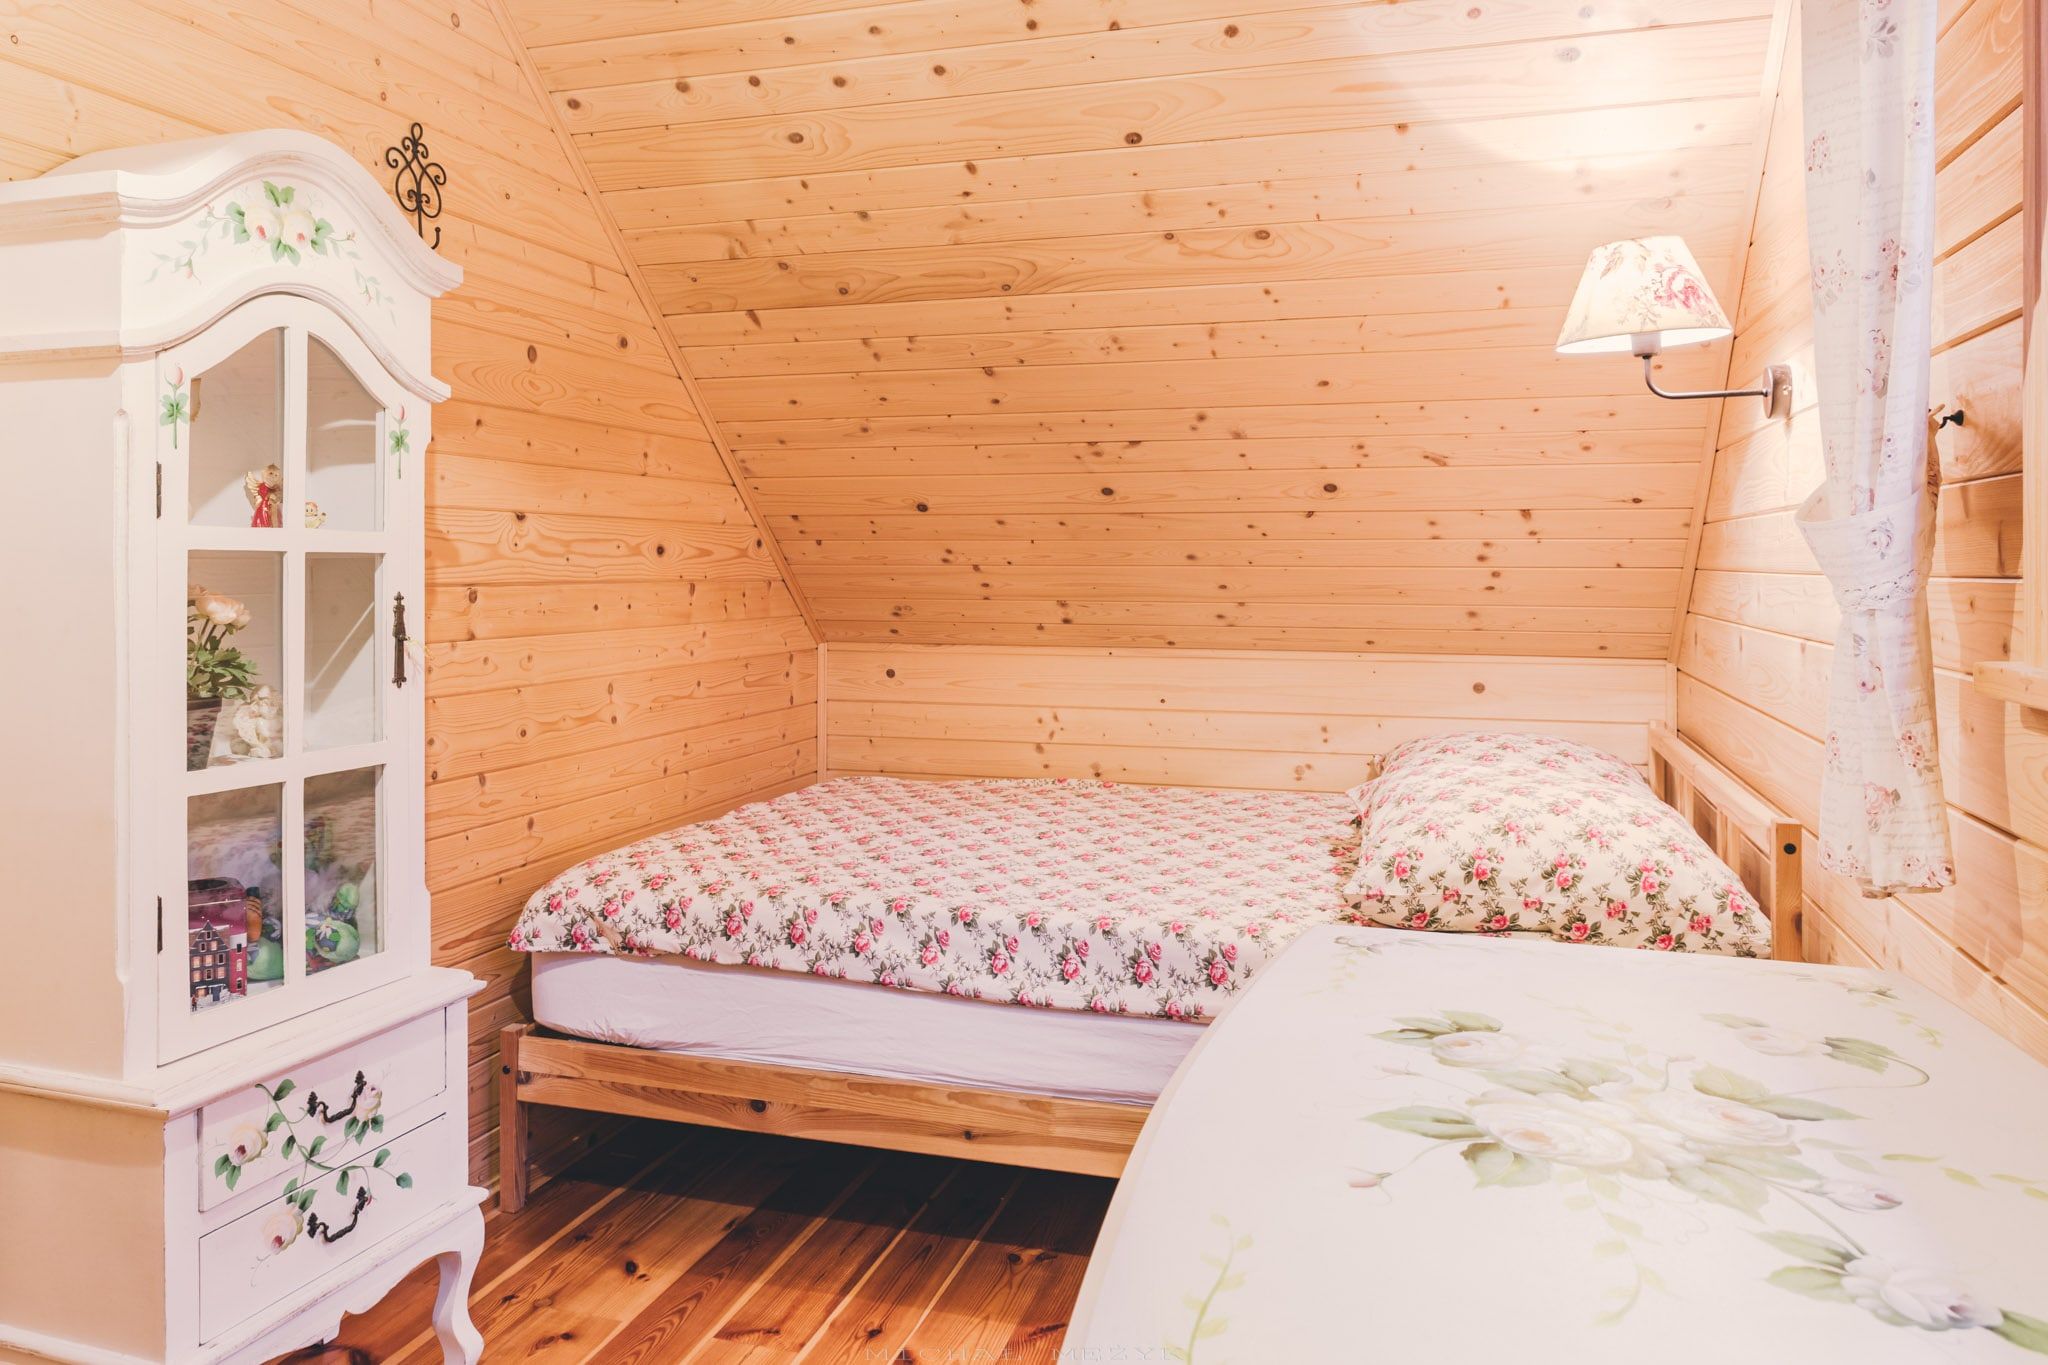 Domek w Rycerce - Where will I sleep?